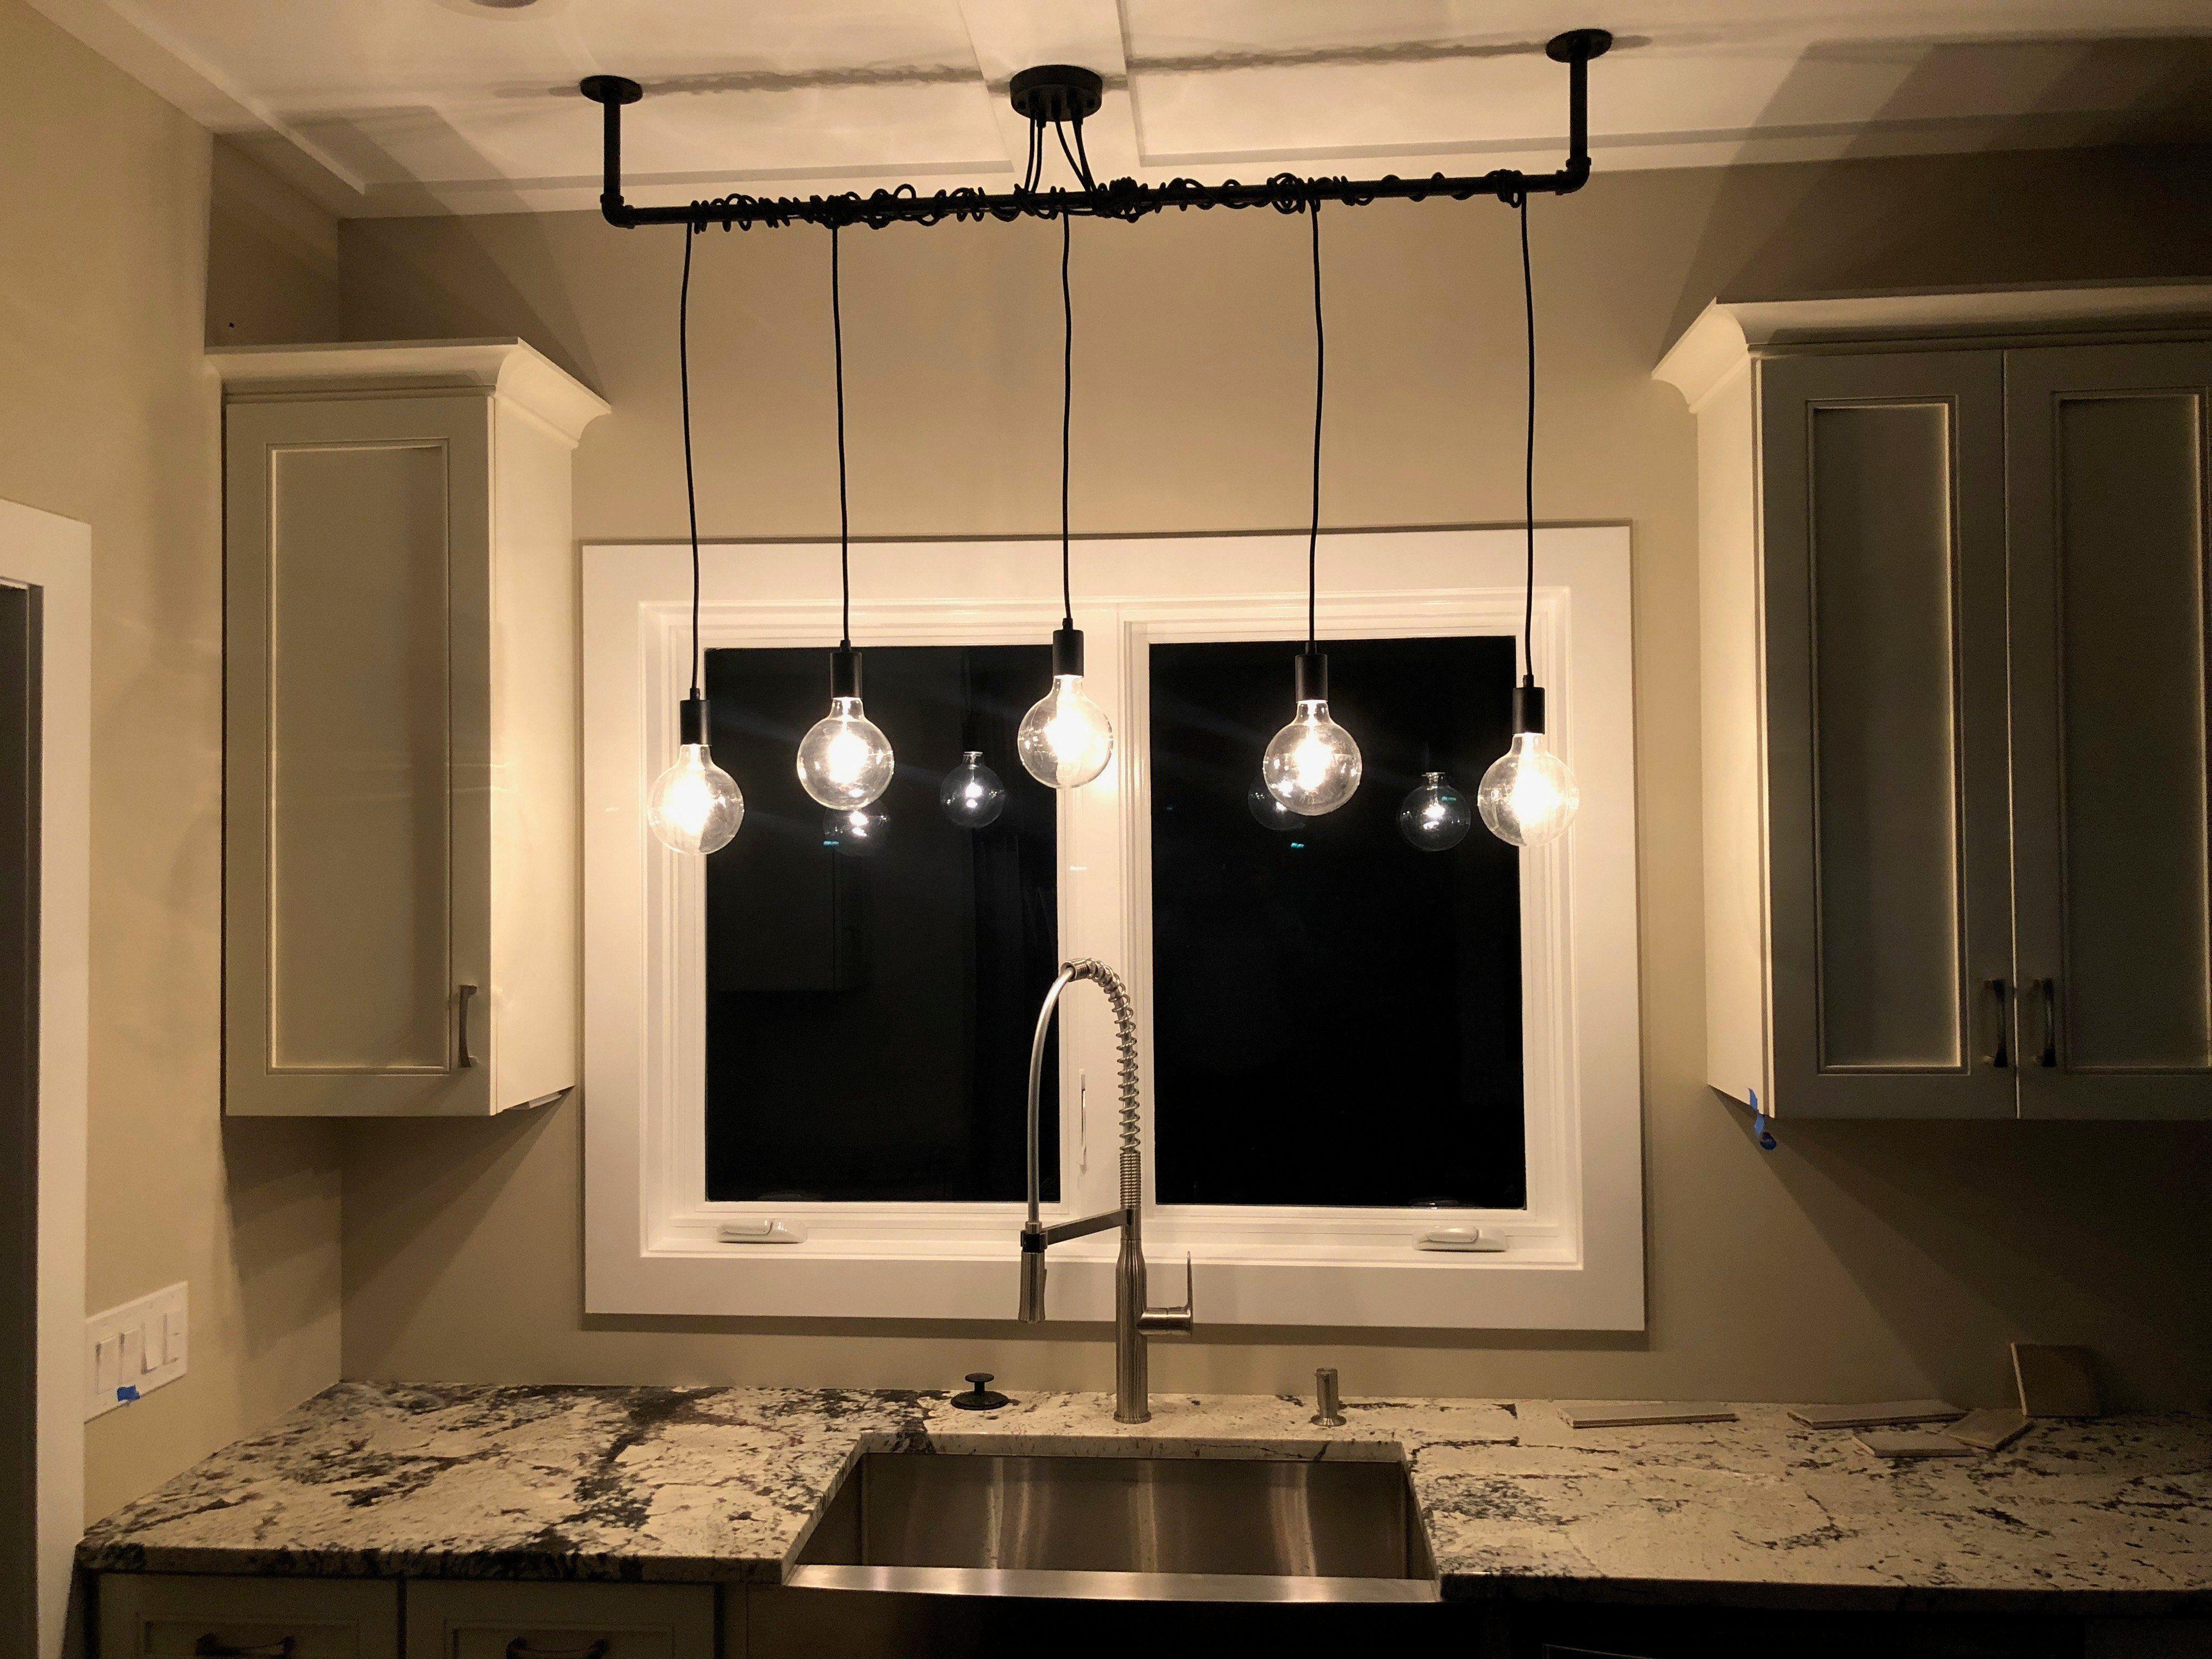 Modern Kitchen Lighting Industrial Lighting Pendant Lights Over